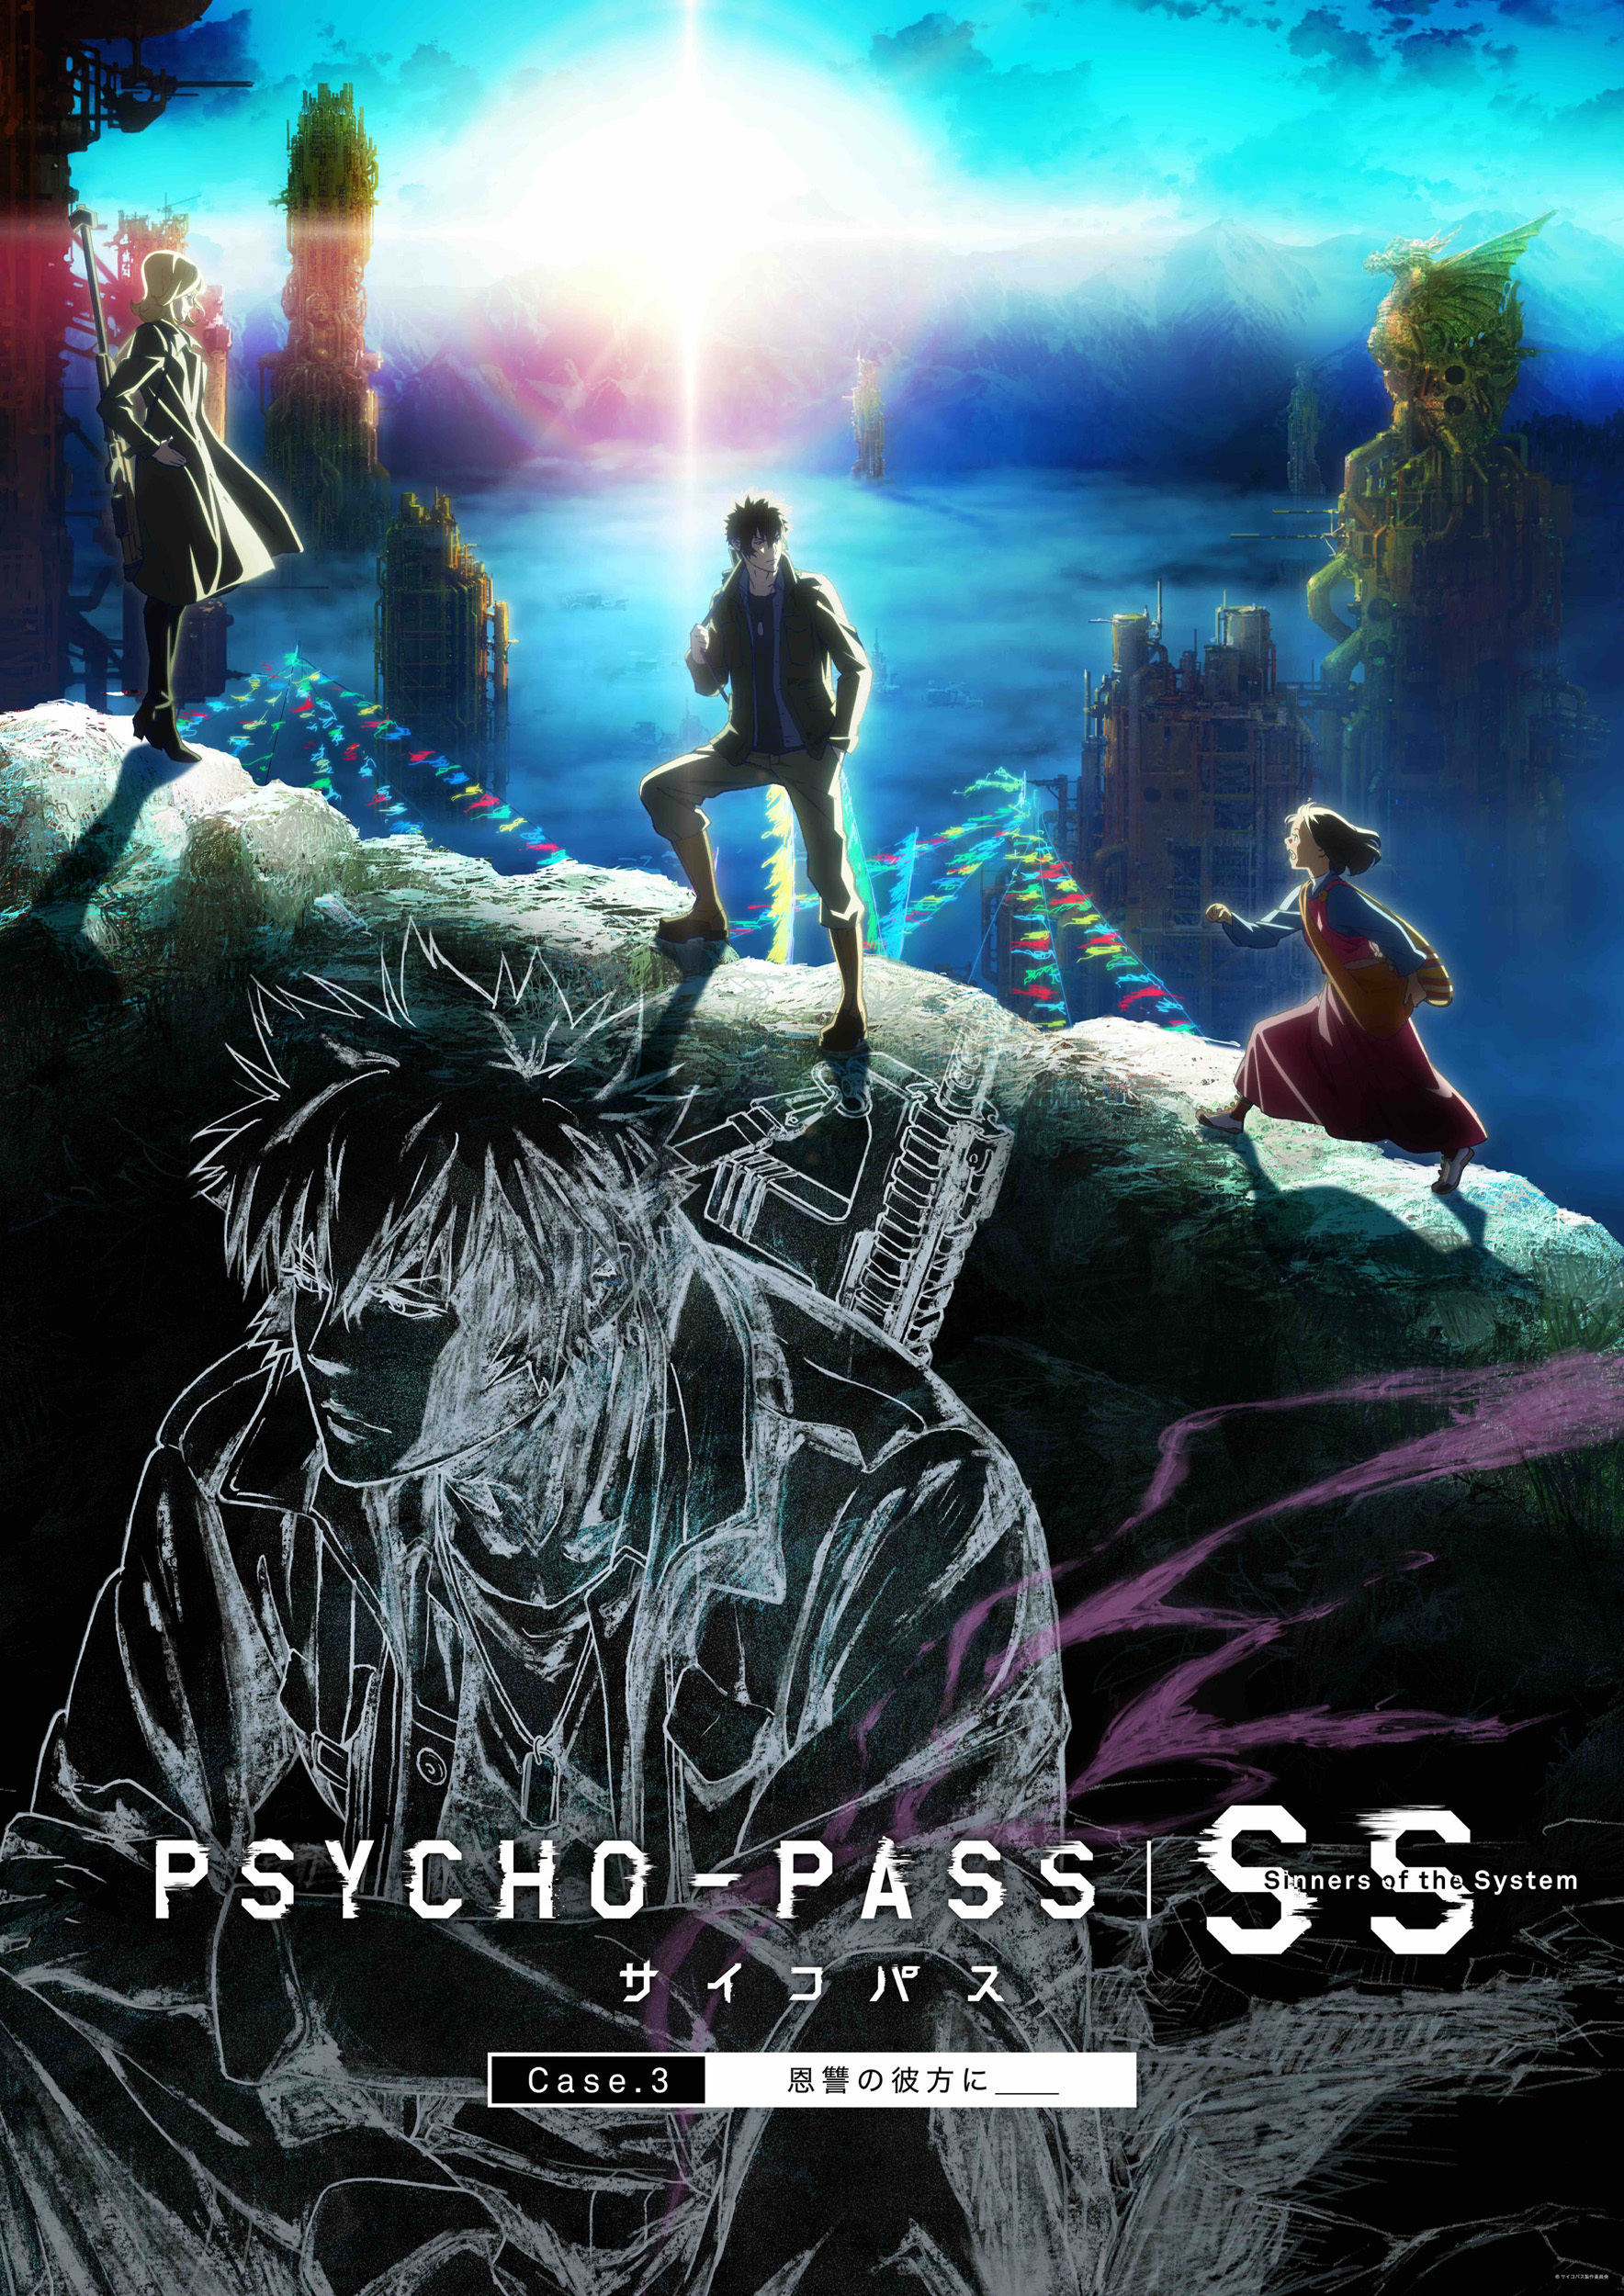 『PSYCHO-PASS サイコパスSinners of the System Case.3恩讐の彼方に__』 (c)サイコパス製作委員会